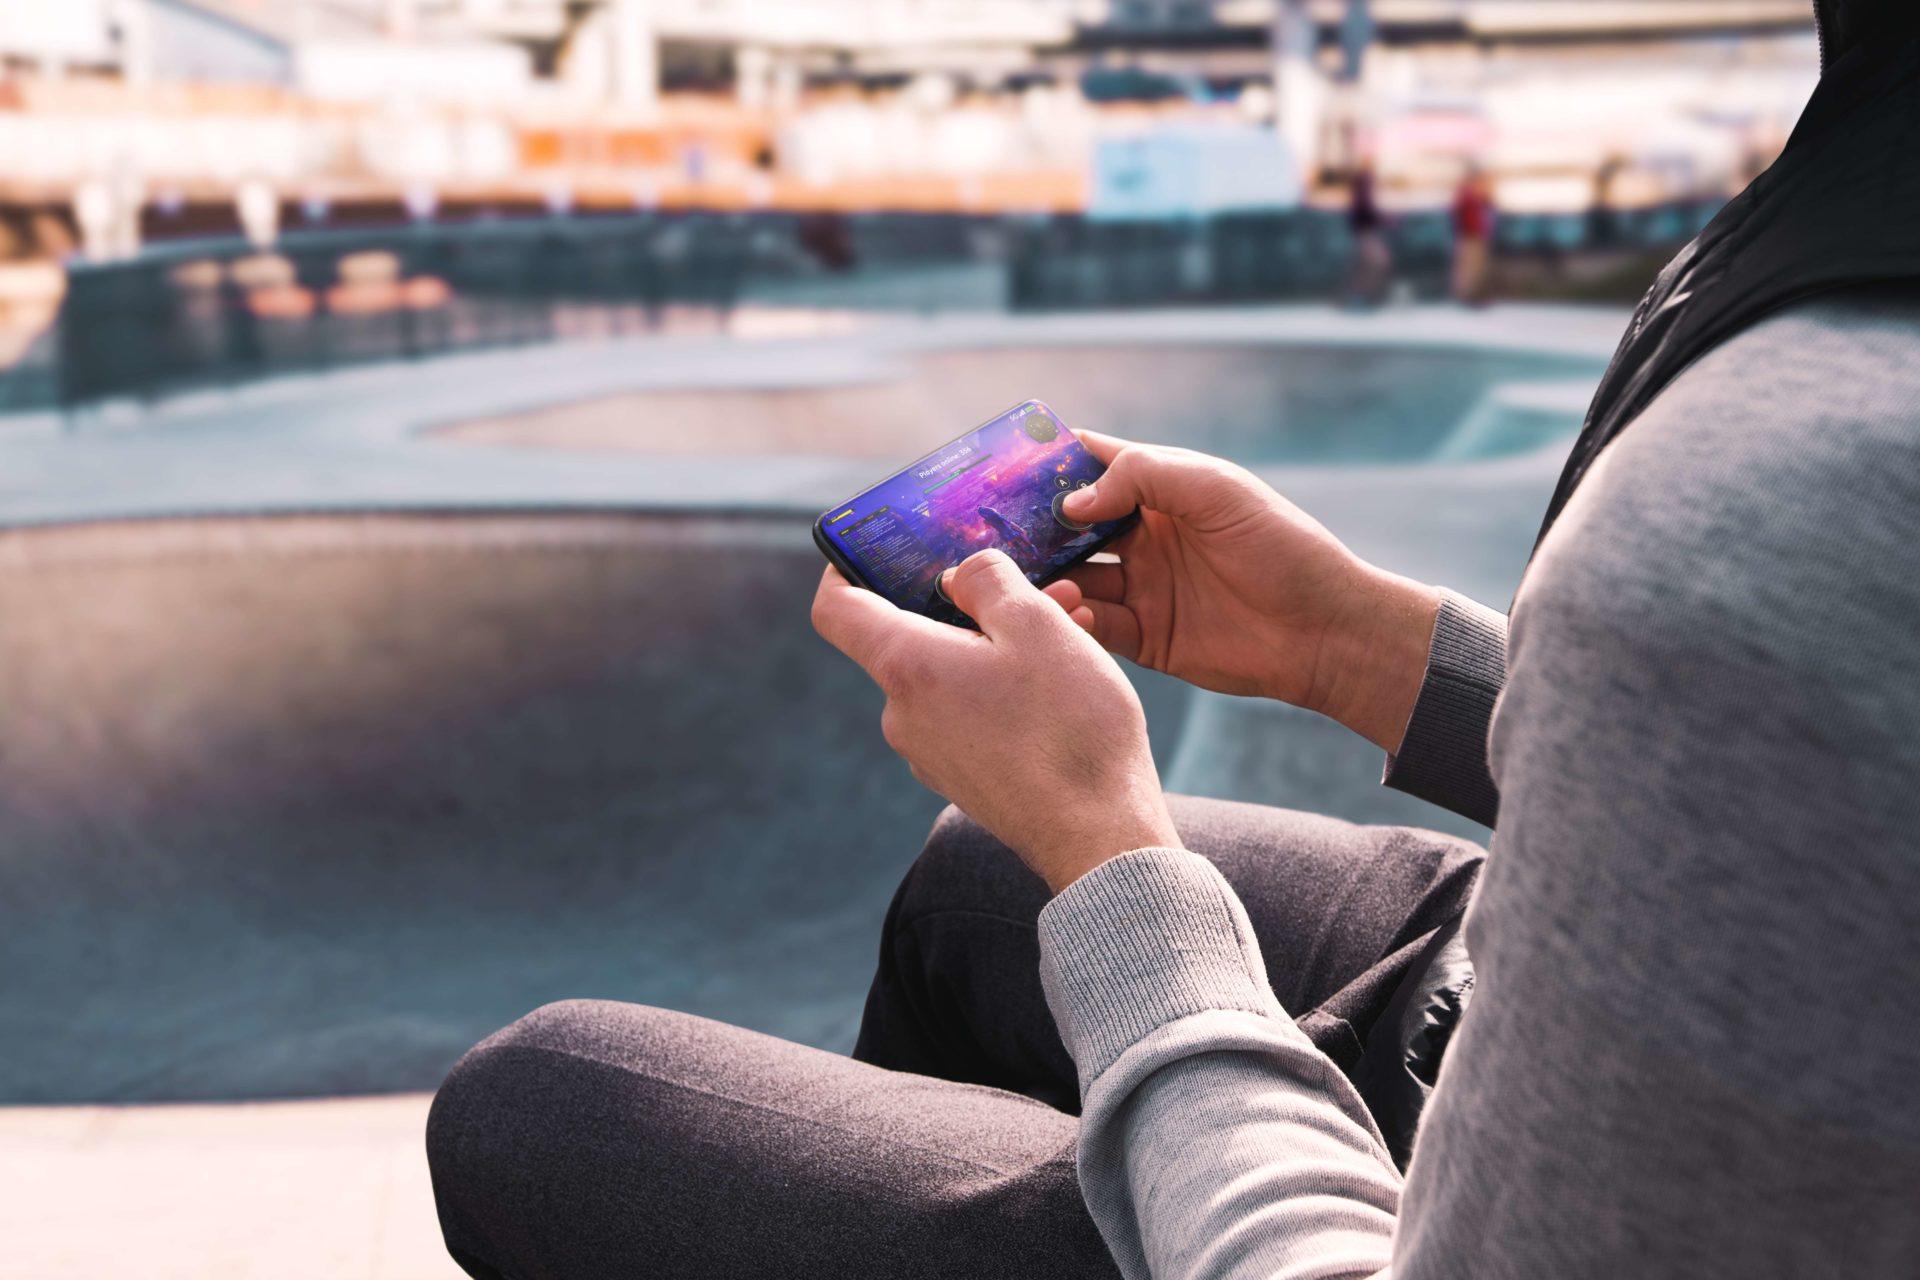 smartfon, konsument